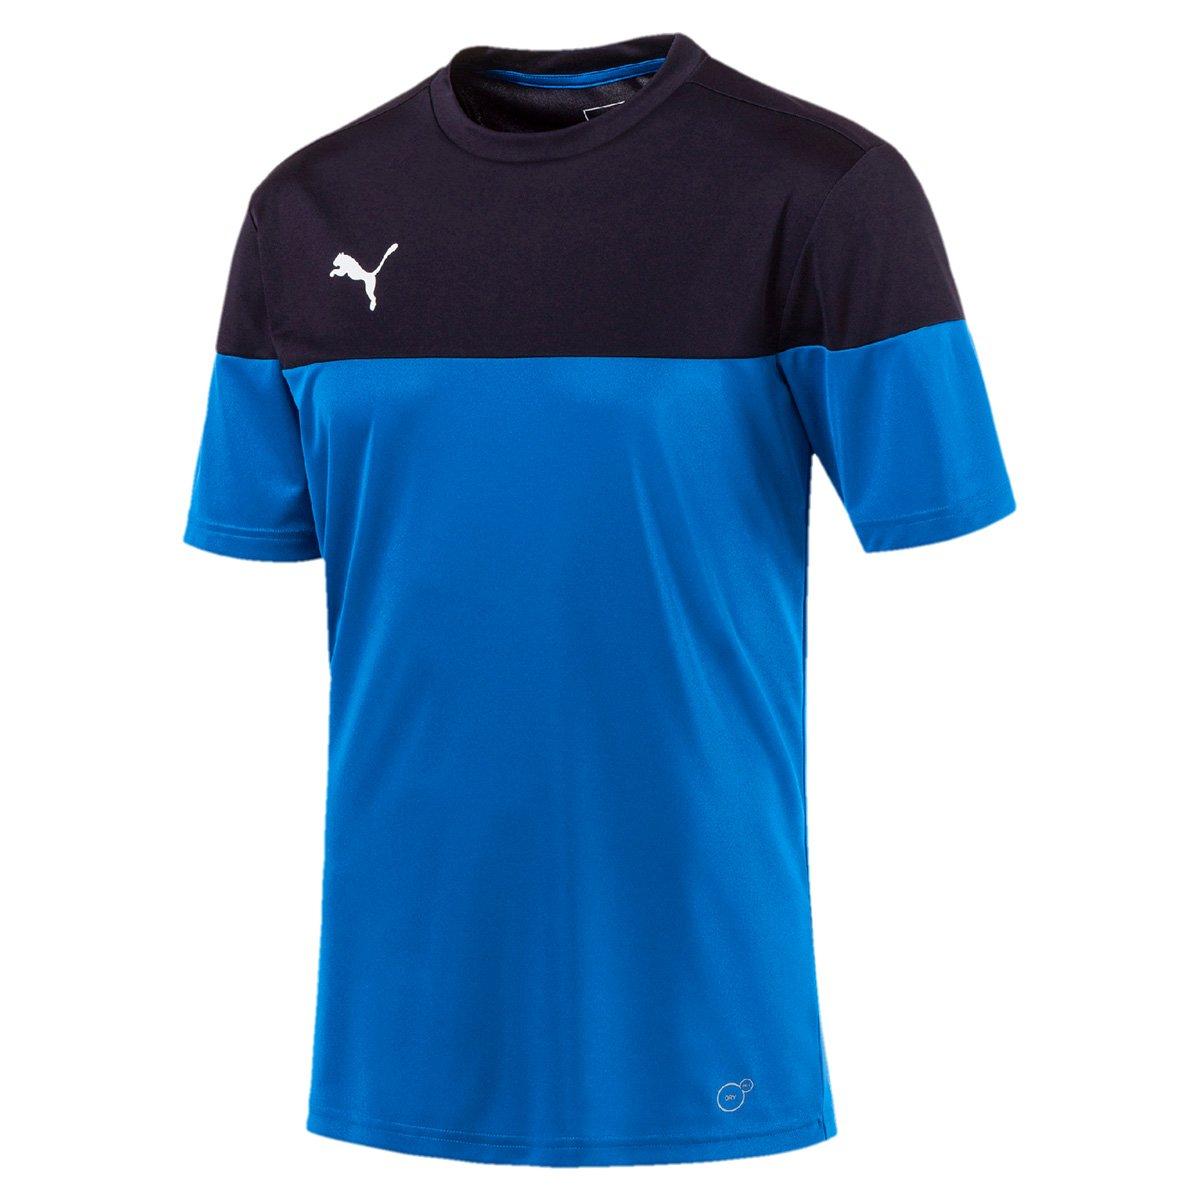 Camisa Puma Play Masculina be7356c14493b